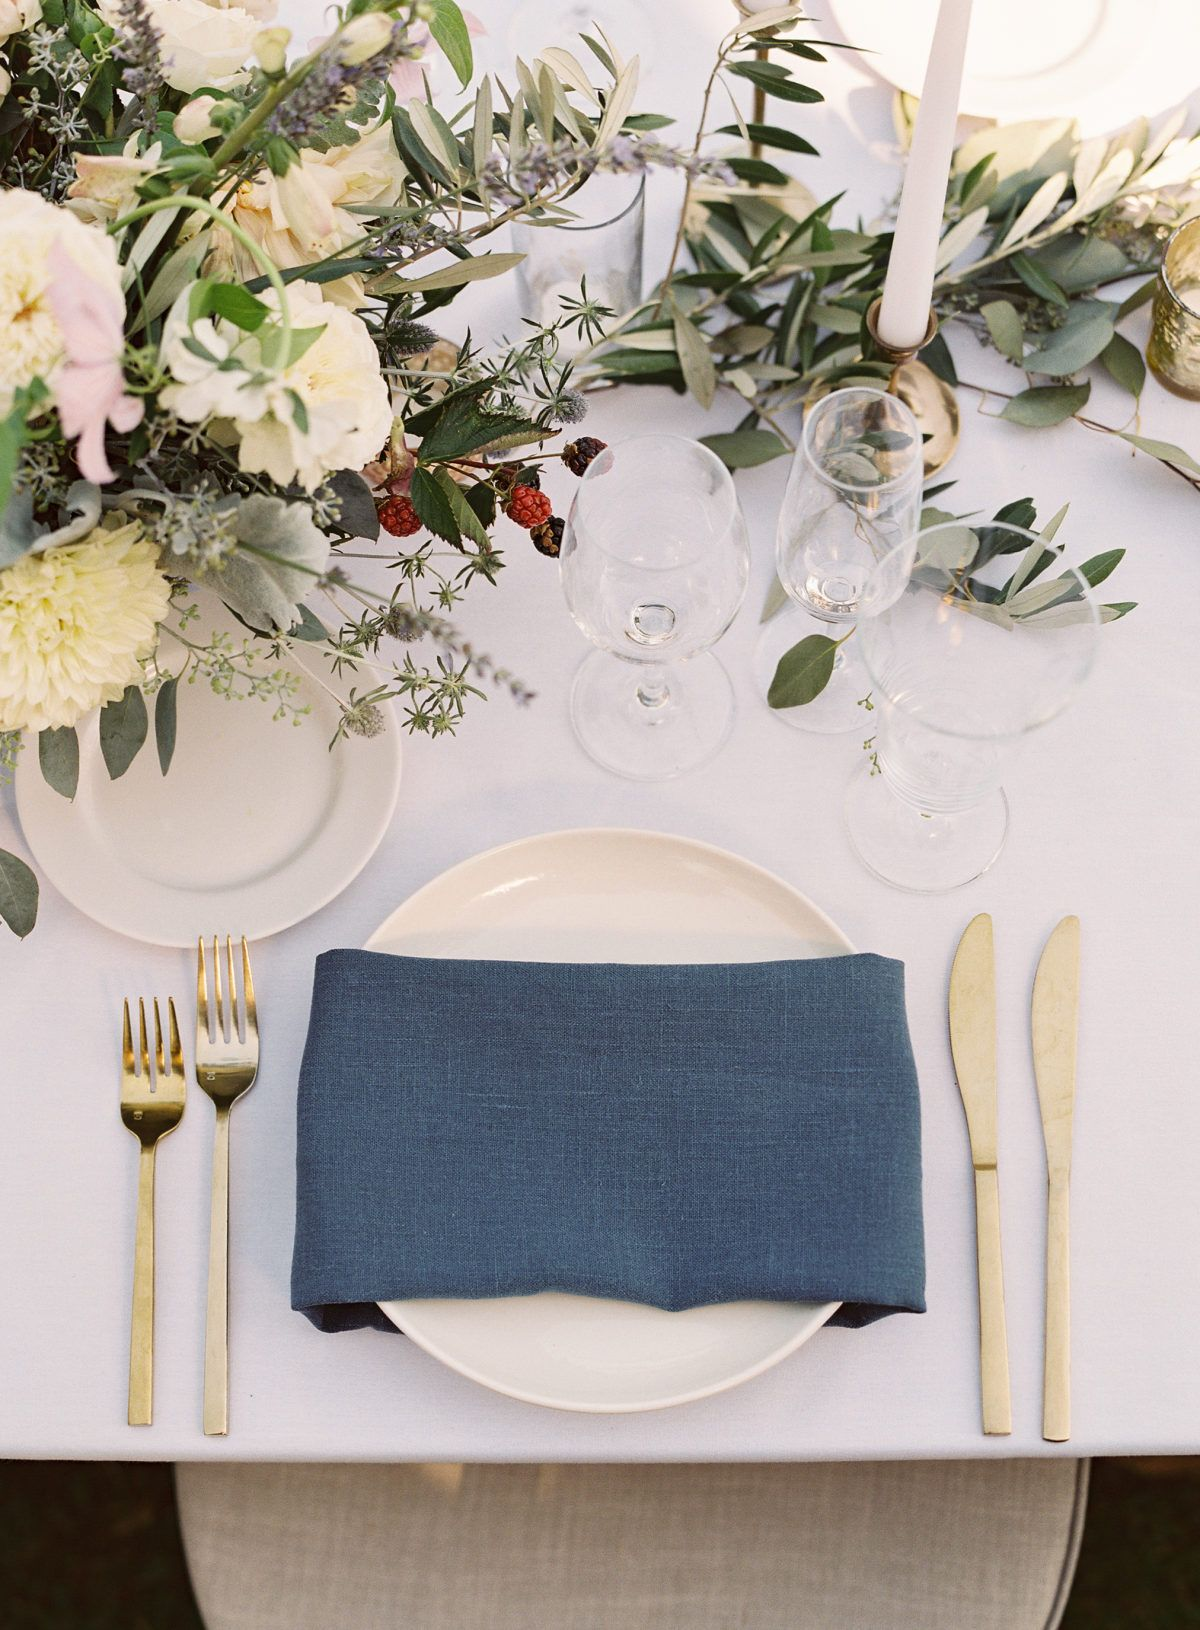 Finding the Most Picturesque Wedding Venue Via Pinterest #gedecktertisch